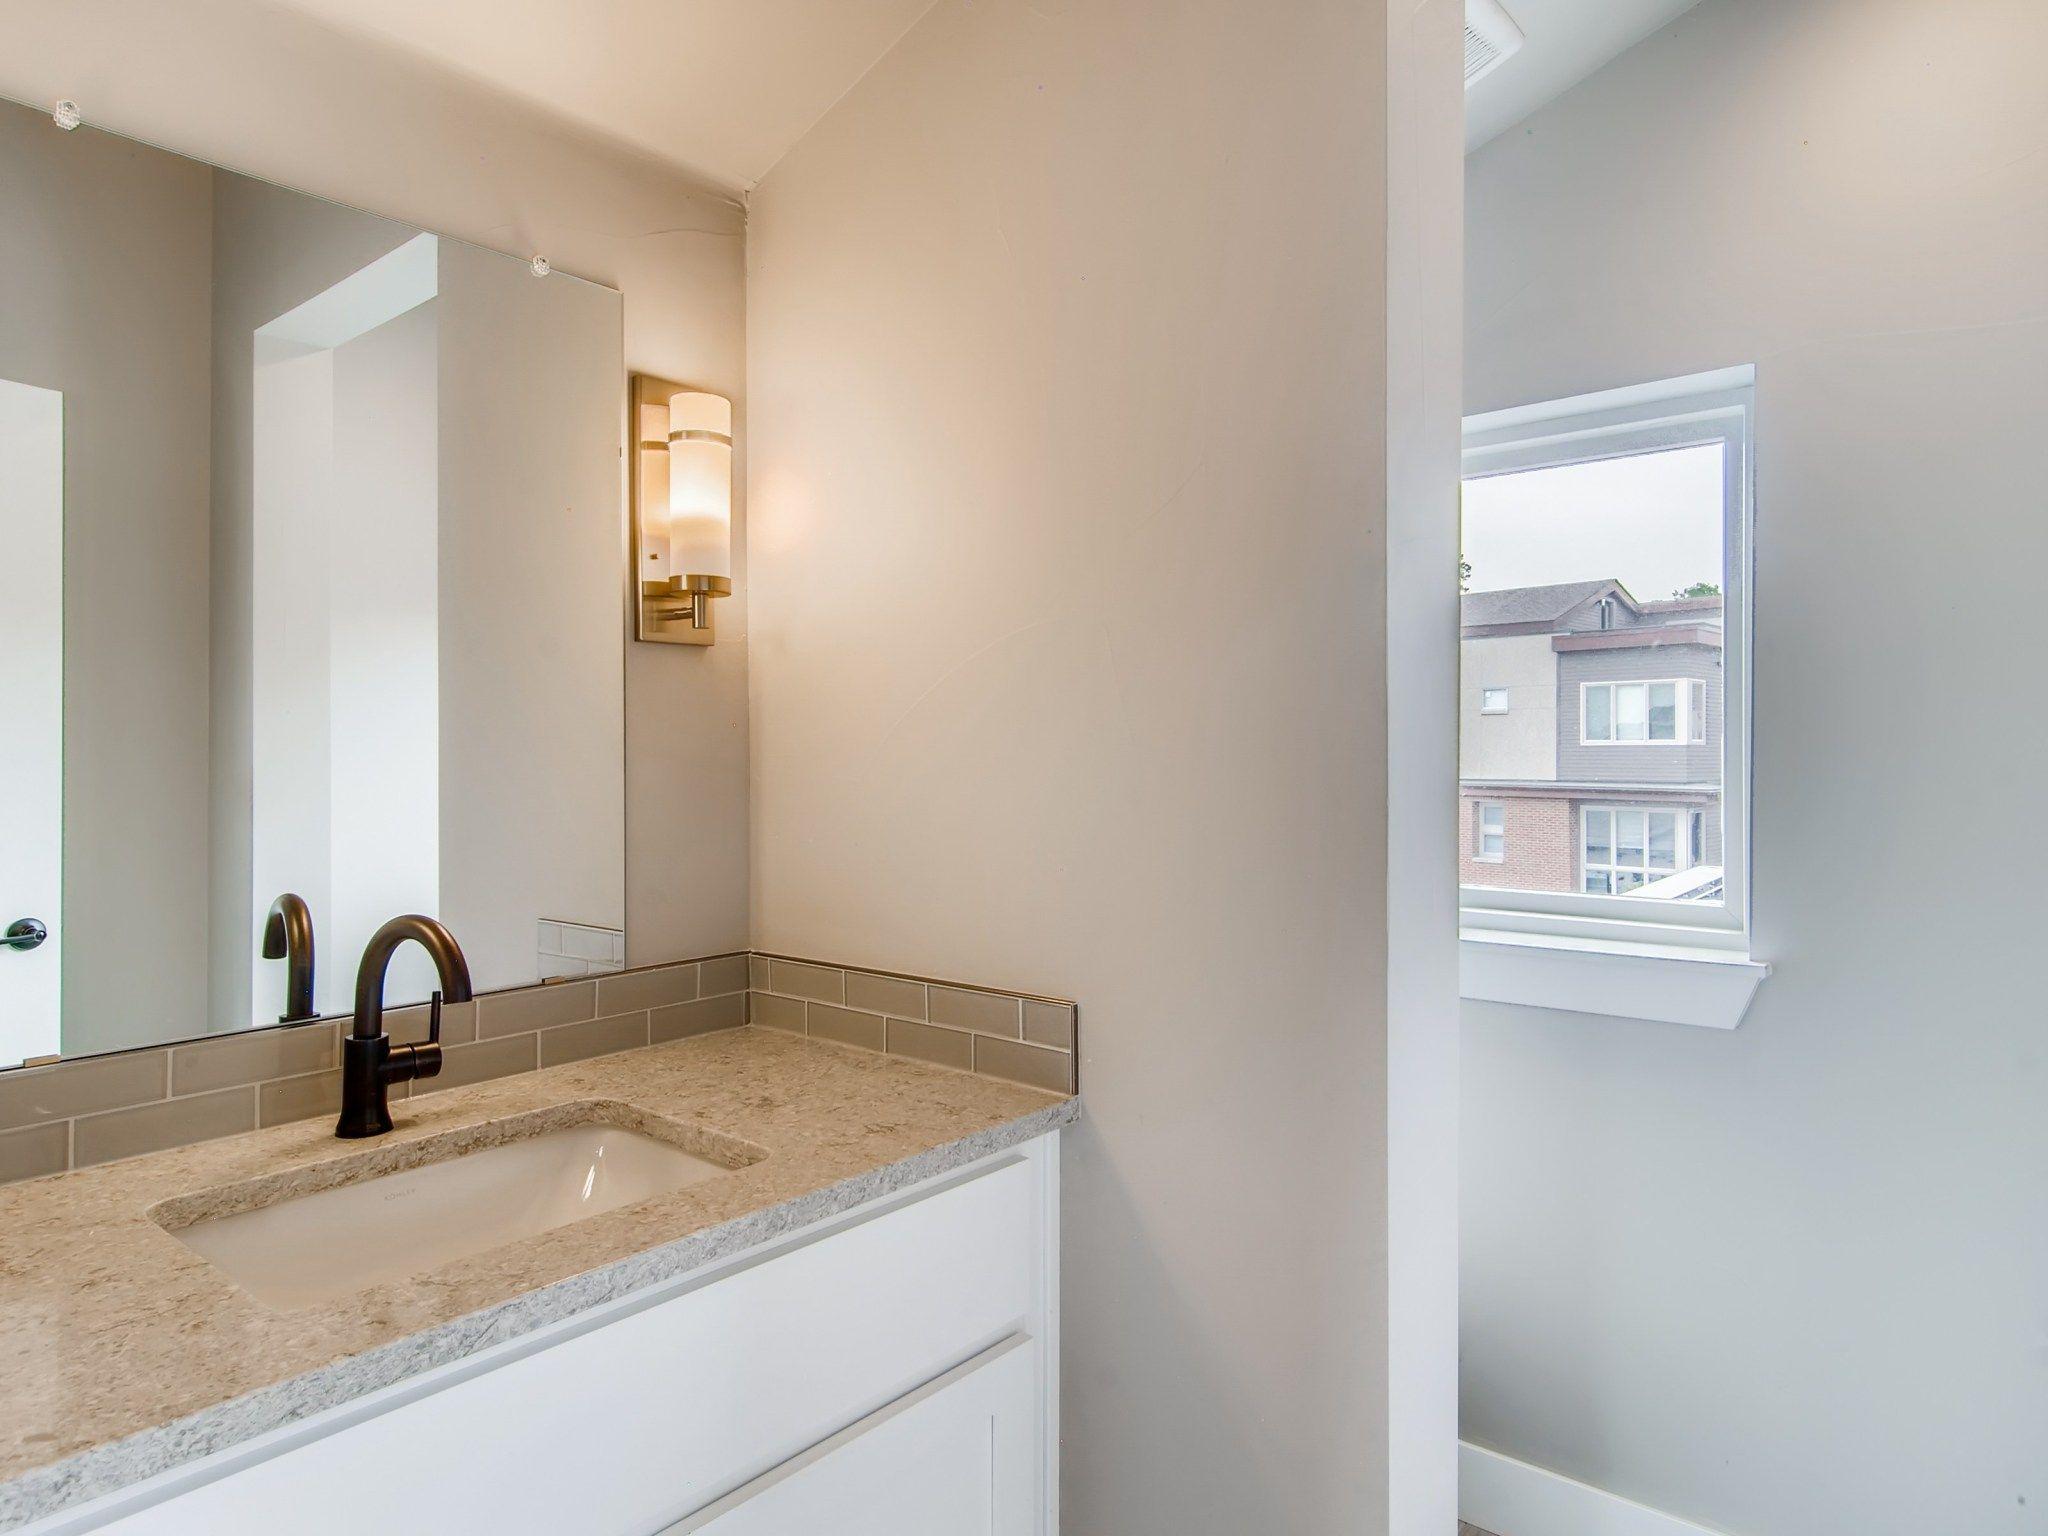 Bathroom featured in the Case By Koelbel Urban Homes in Denver, CO